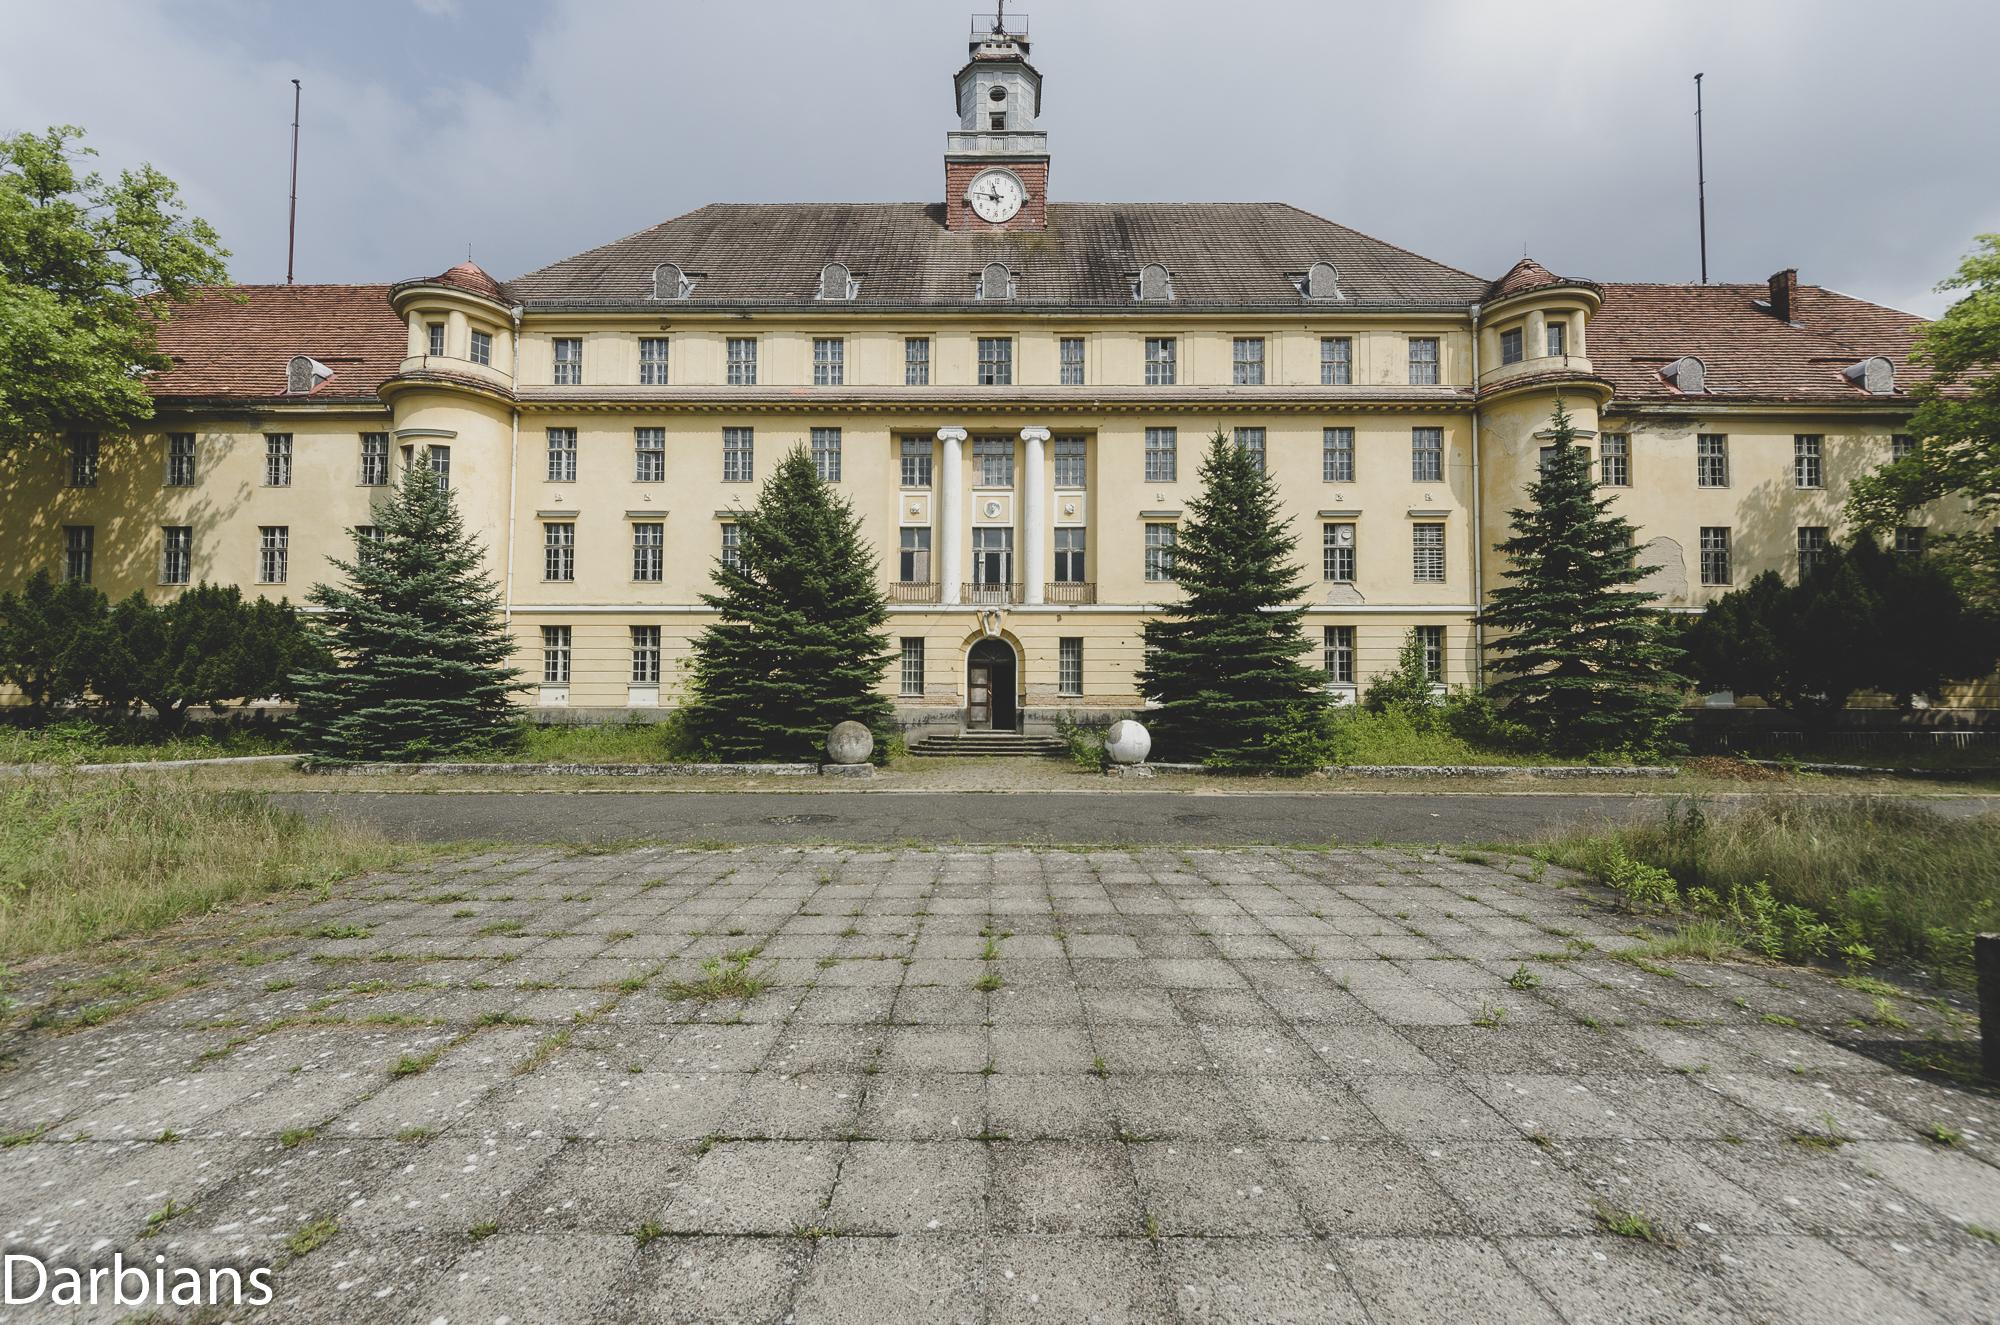 Haus Der Offiziere Wünsdorf Main Building